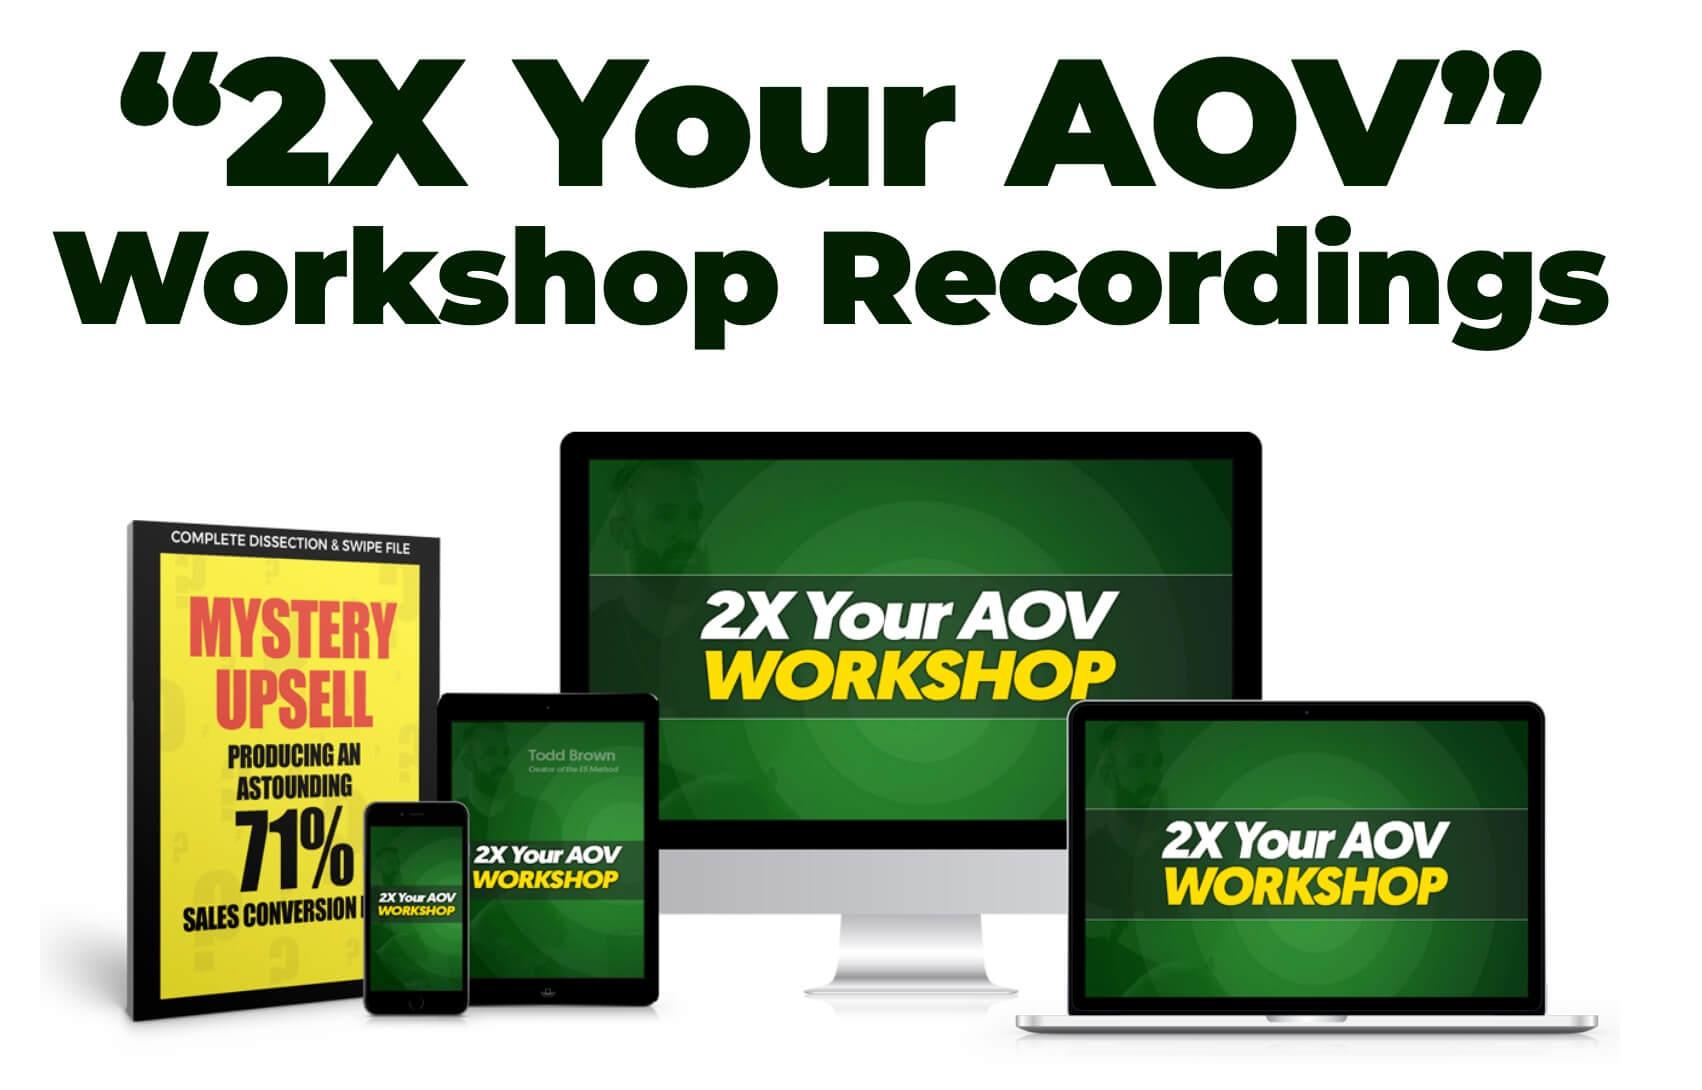 Todd Brown AOV Workshop Recordings